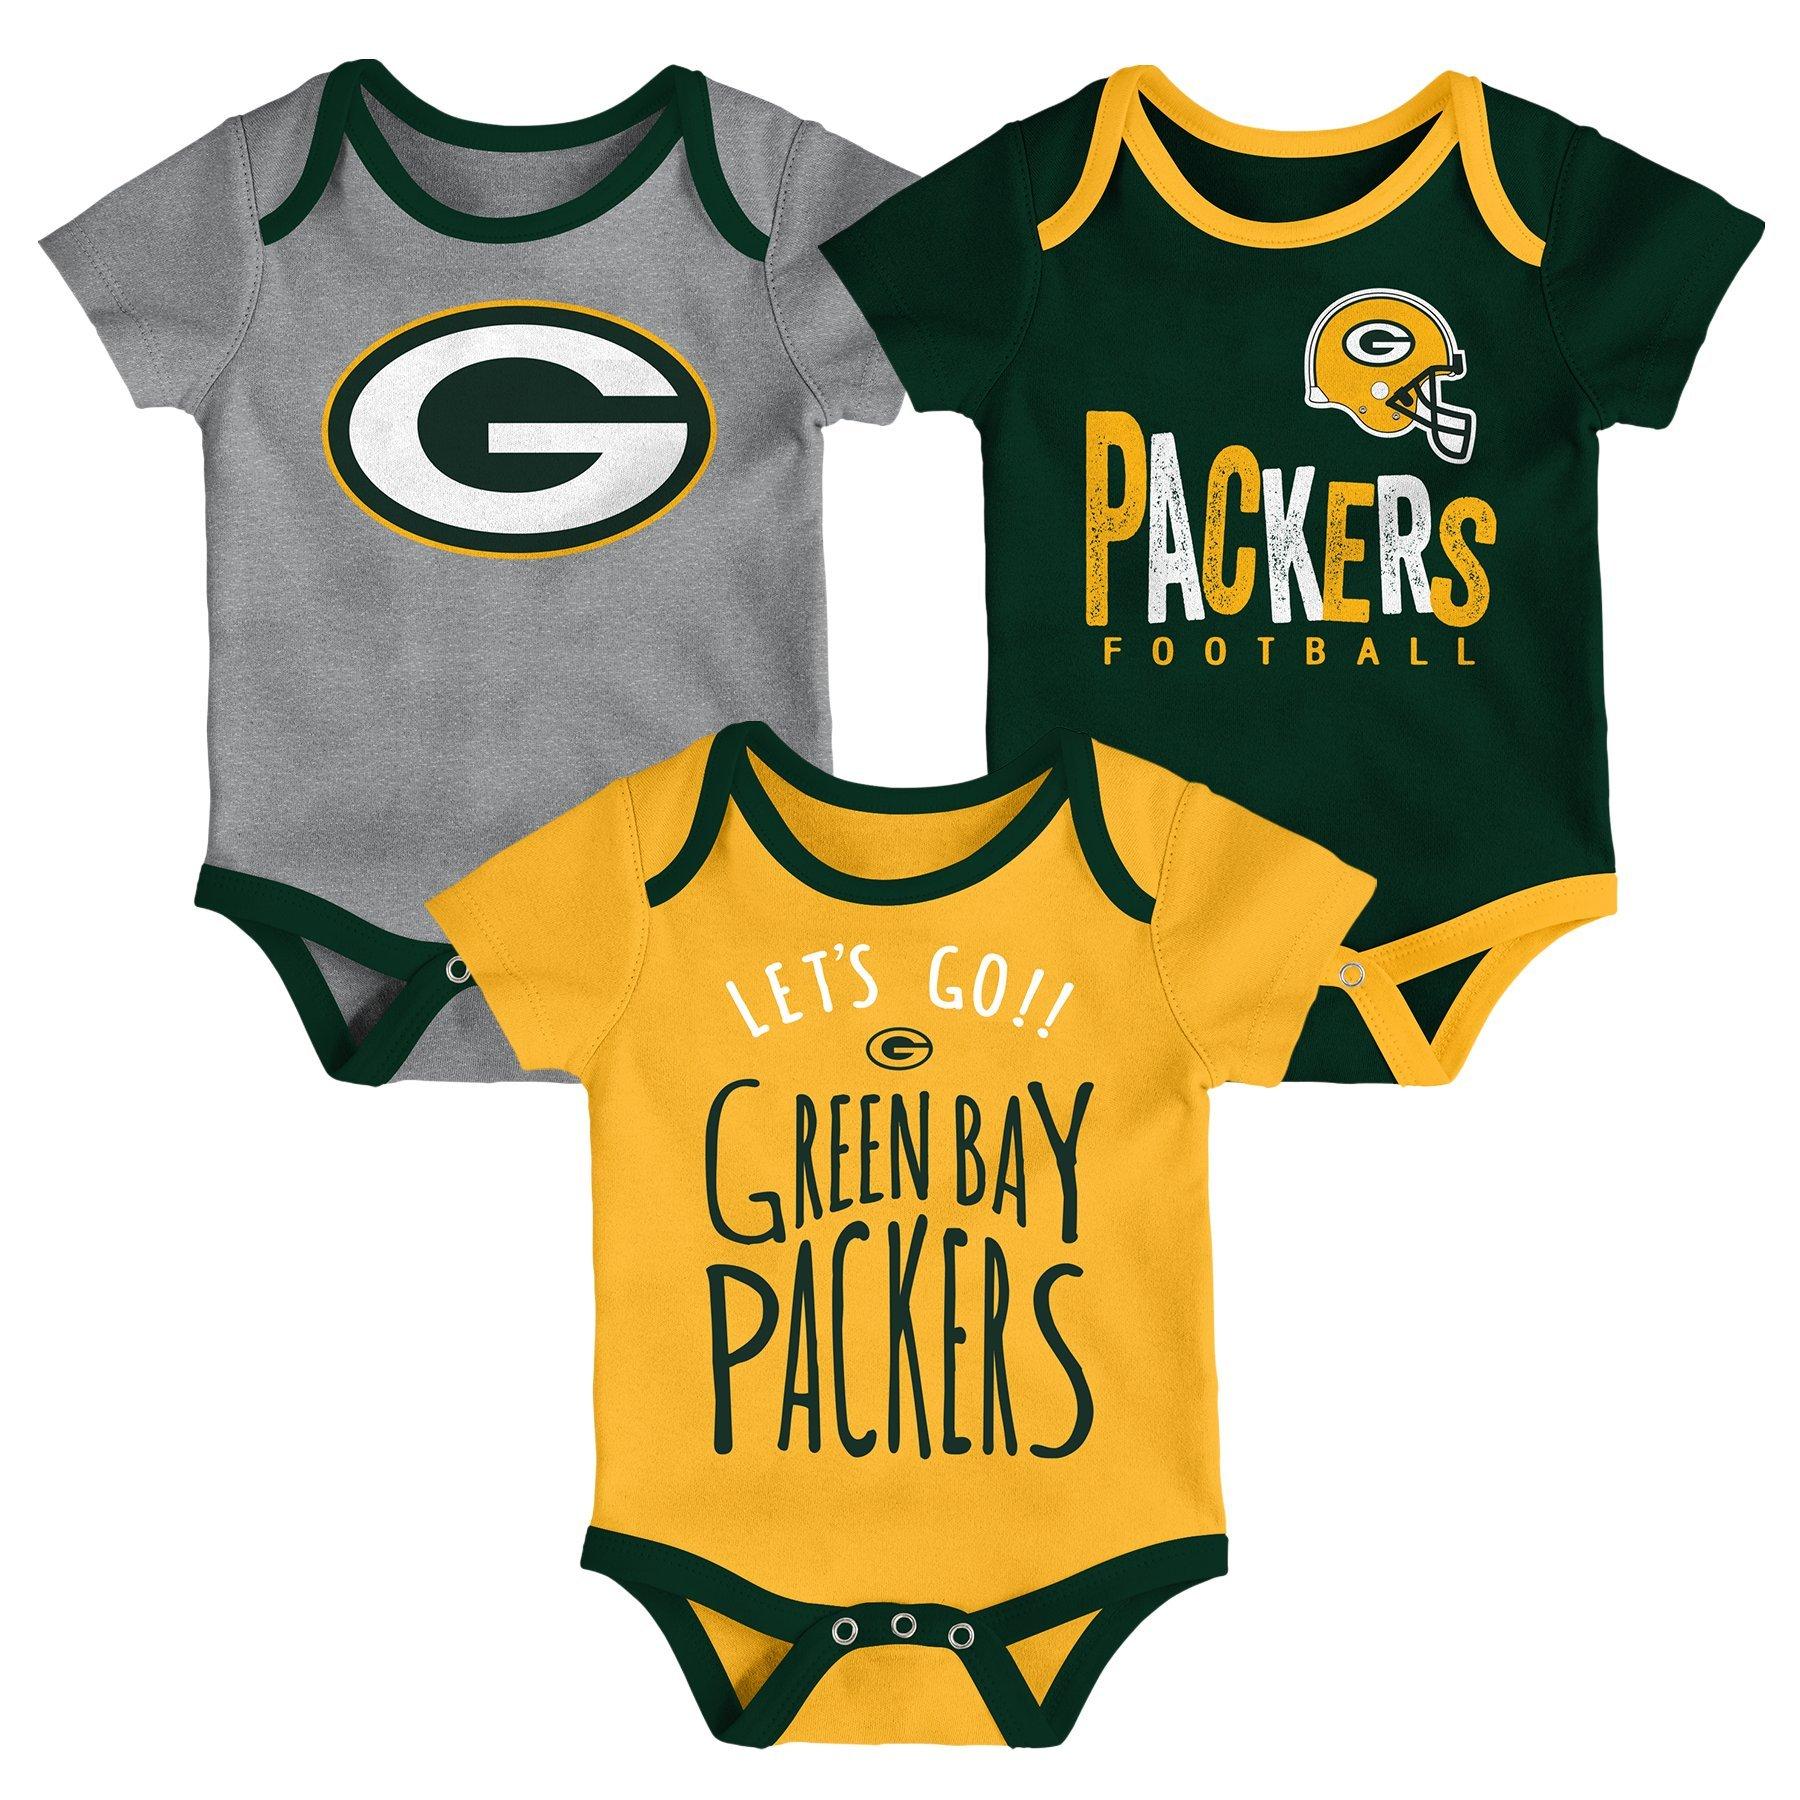 d8e708e6 NFL by Outerstuff NFL Green Bay Packers Newborn & Infant Little ...